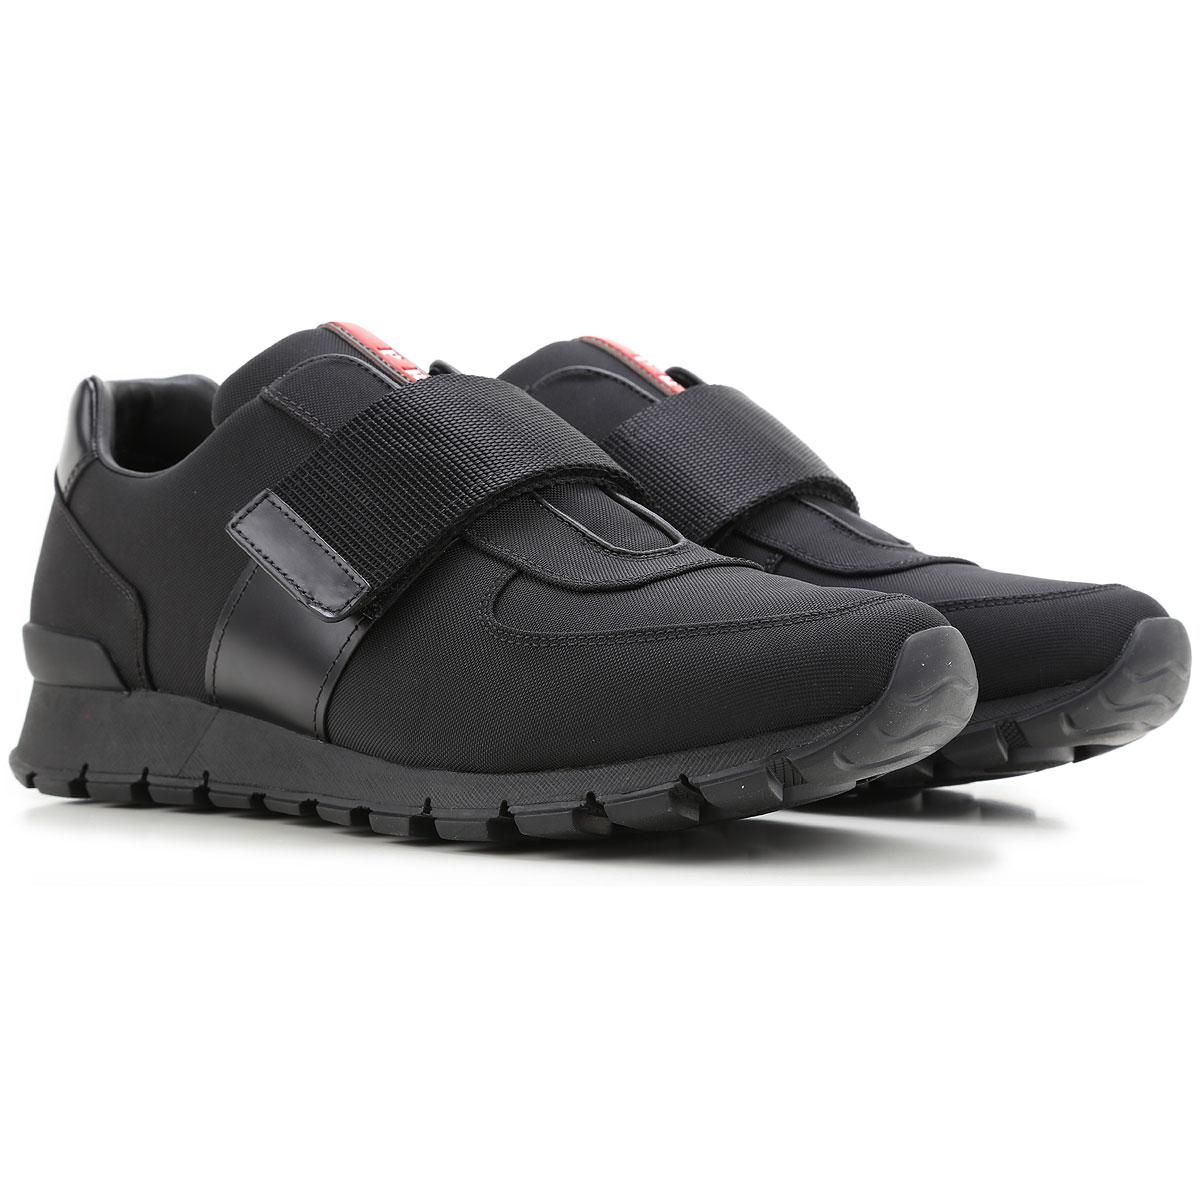 mens shoes prada style code 4e3012 0ls 002. Black Bedroom Furniture Sets. Home Design Ideas